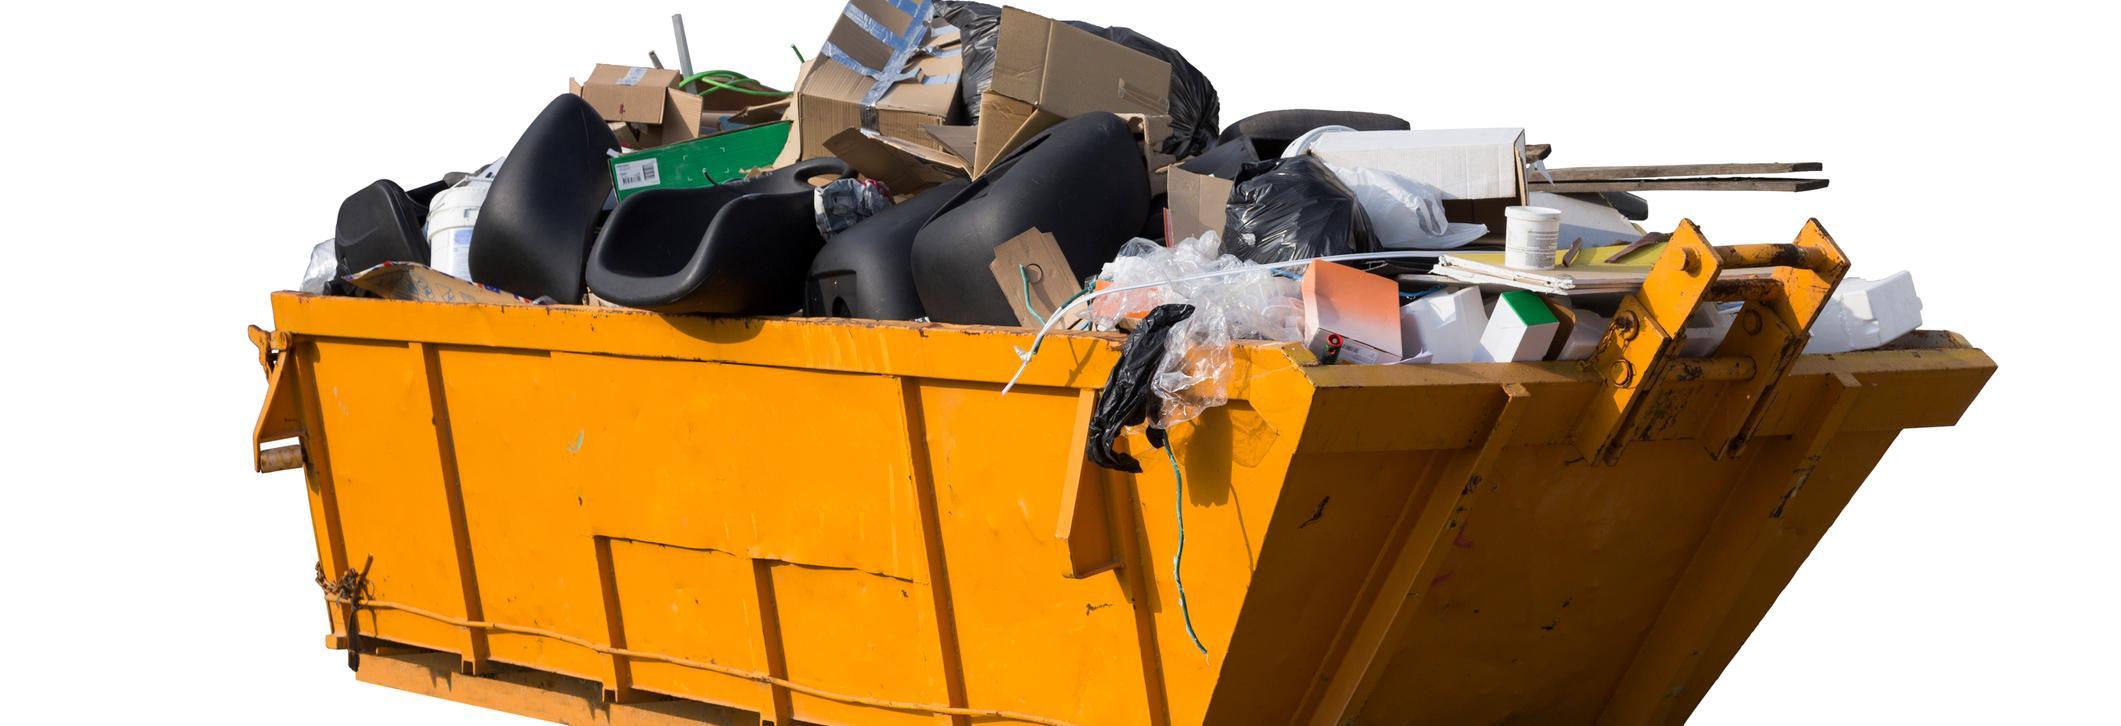 driveway dumpsters residential dumpster service cincinnati ohio